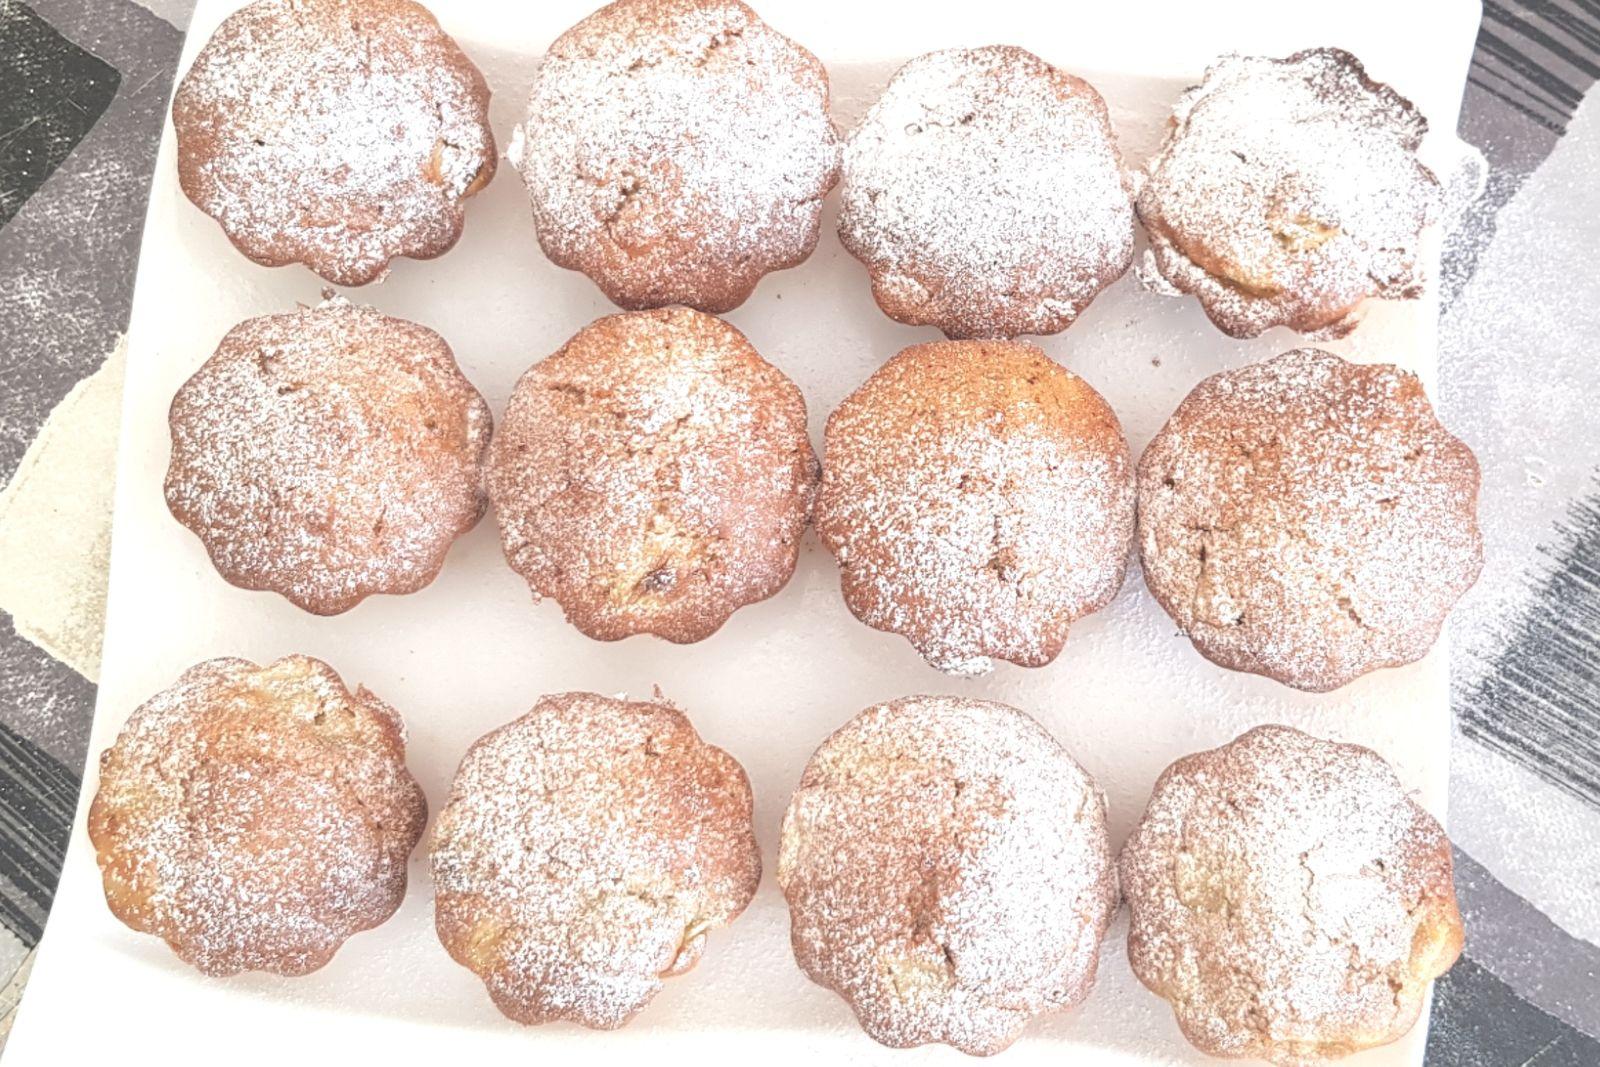 Muffins rhubarbe pommes